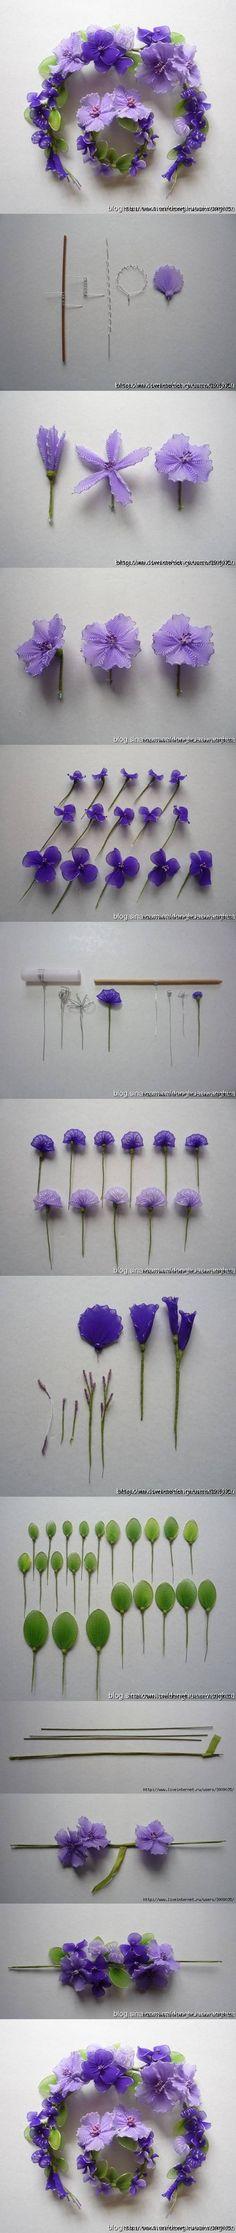 DIY Wire Nylon Flowers DIY Projects | UsefulDIY.com Follow Us on Facebook ==> http://www.facebook.com/UsefulDiy